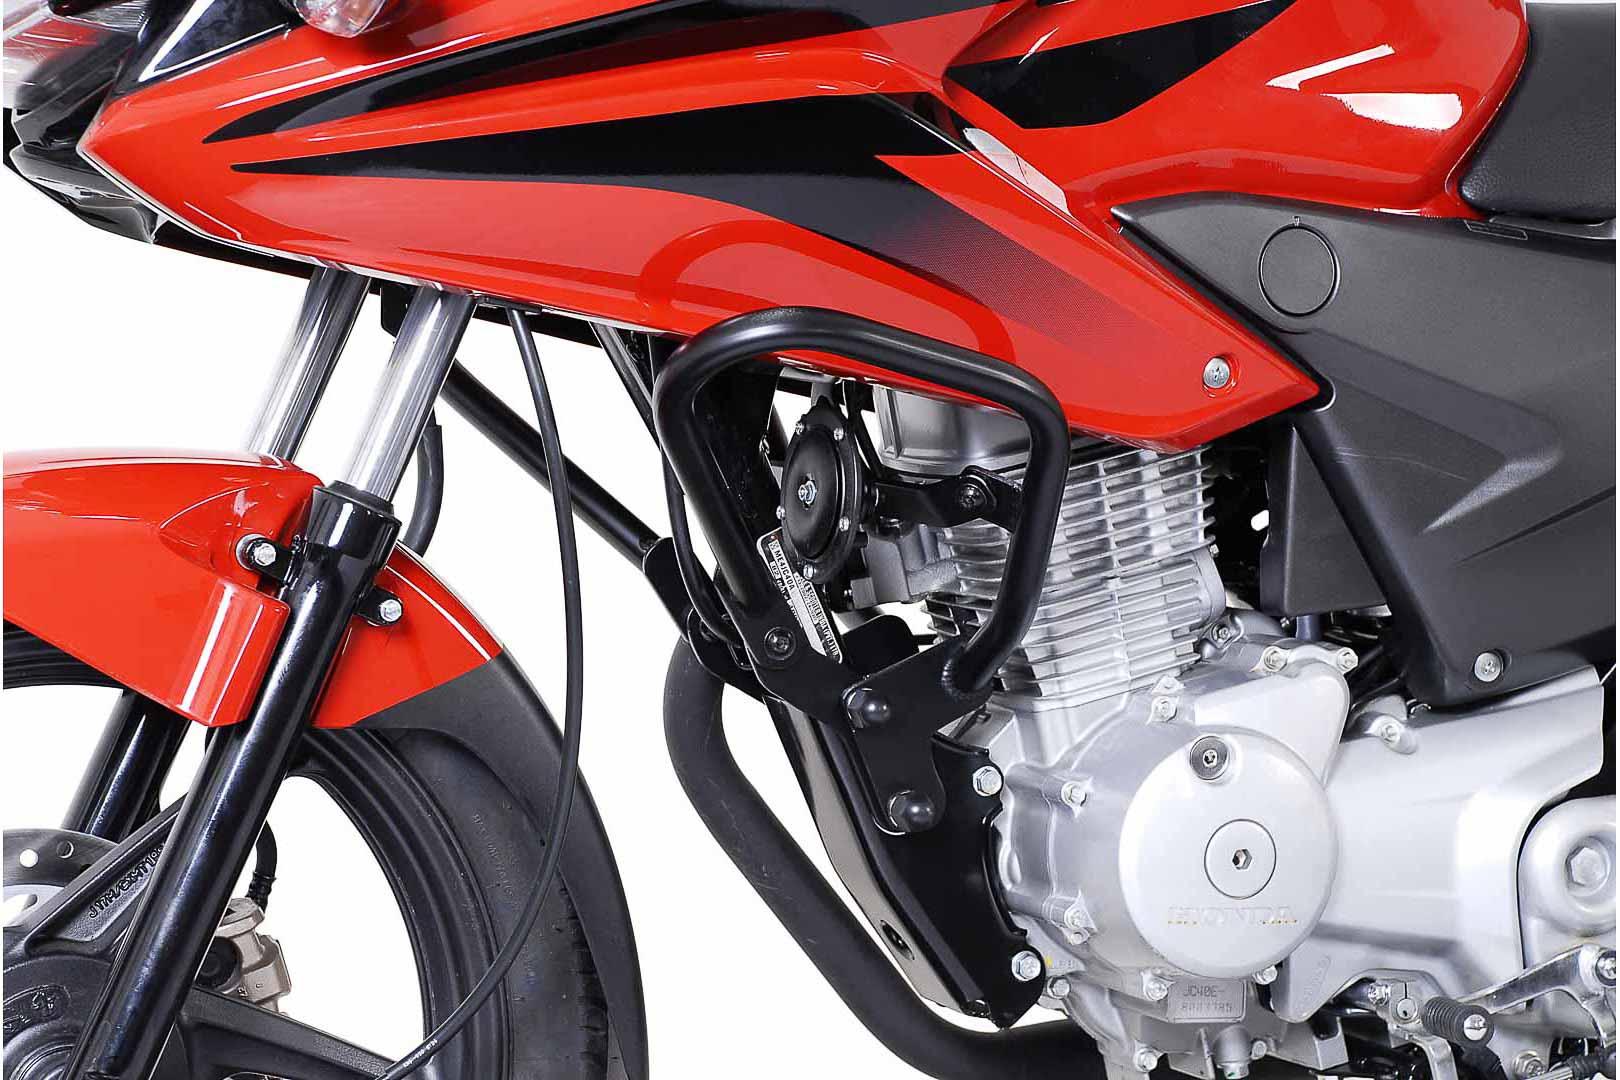 SW-Motech Moottorinsuojarauta Honda CBF125 09-, musta